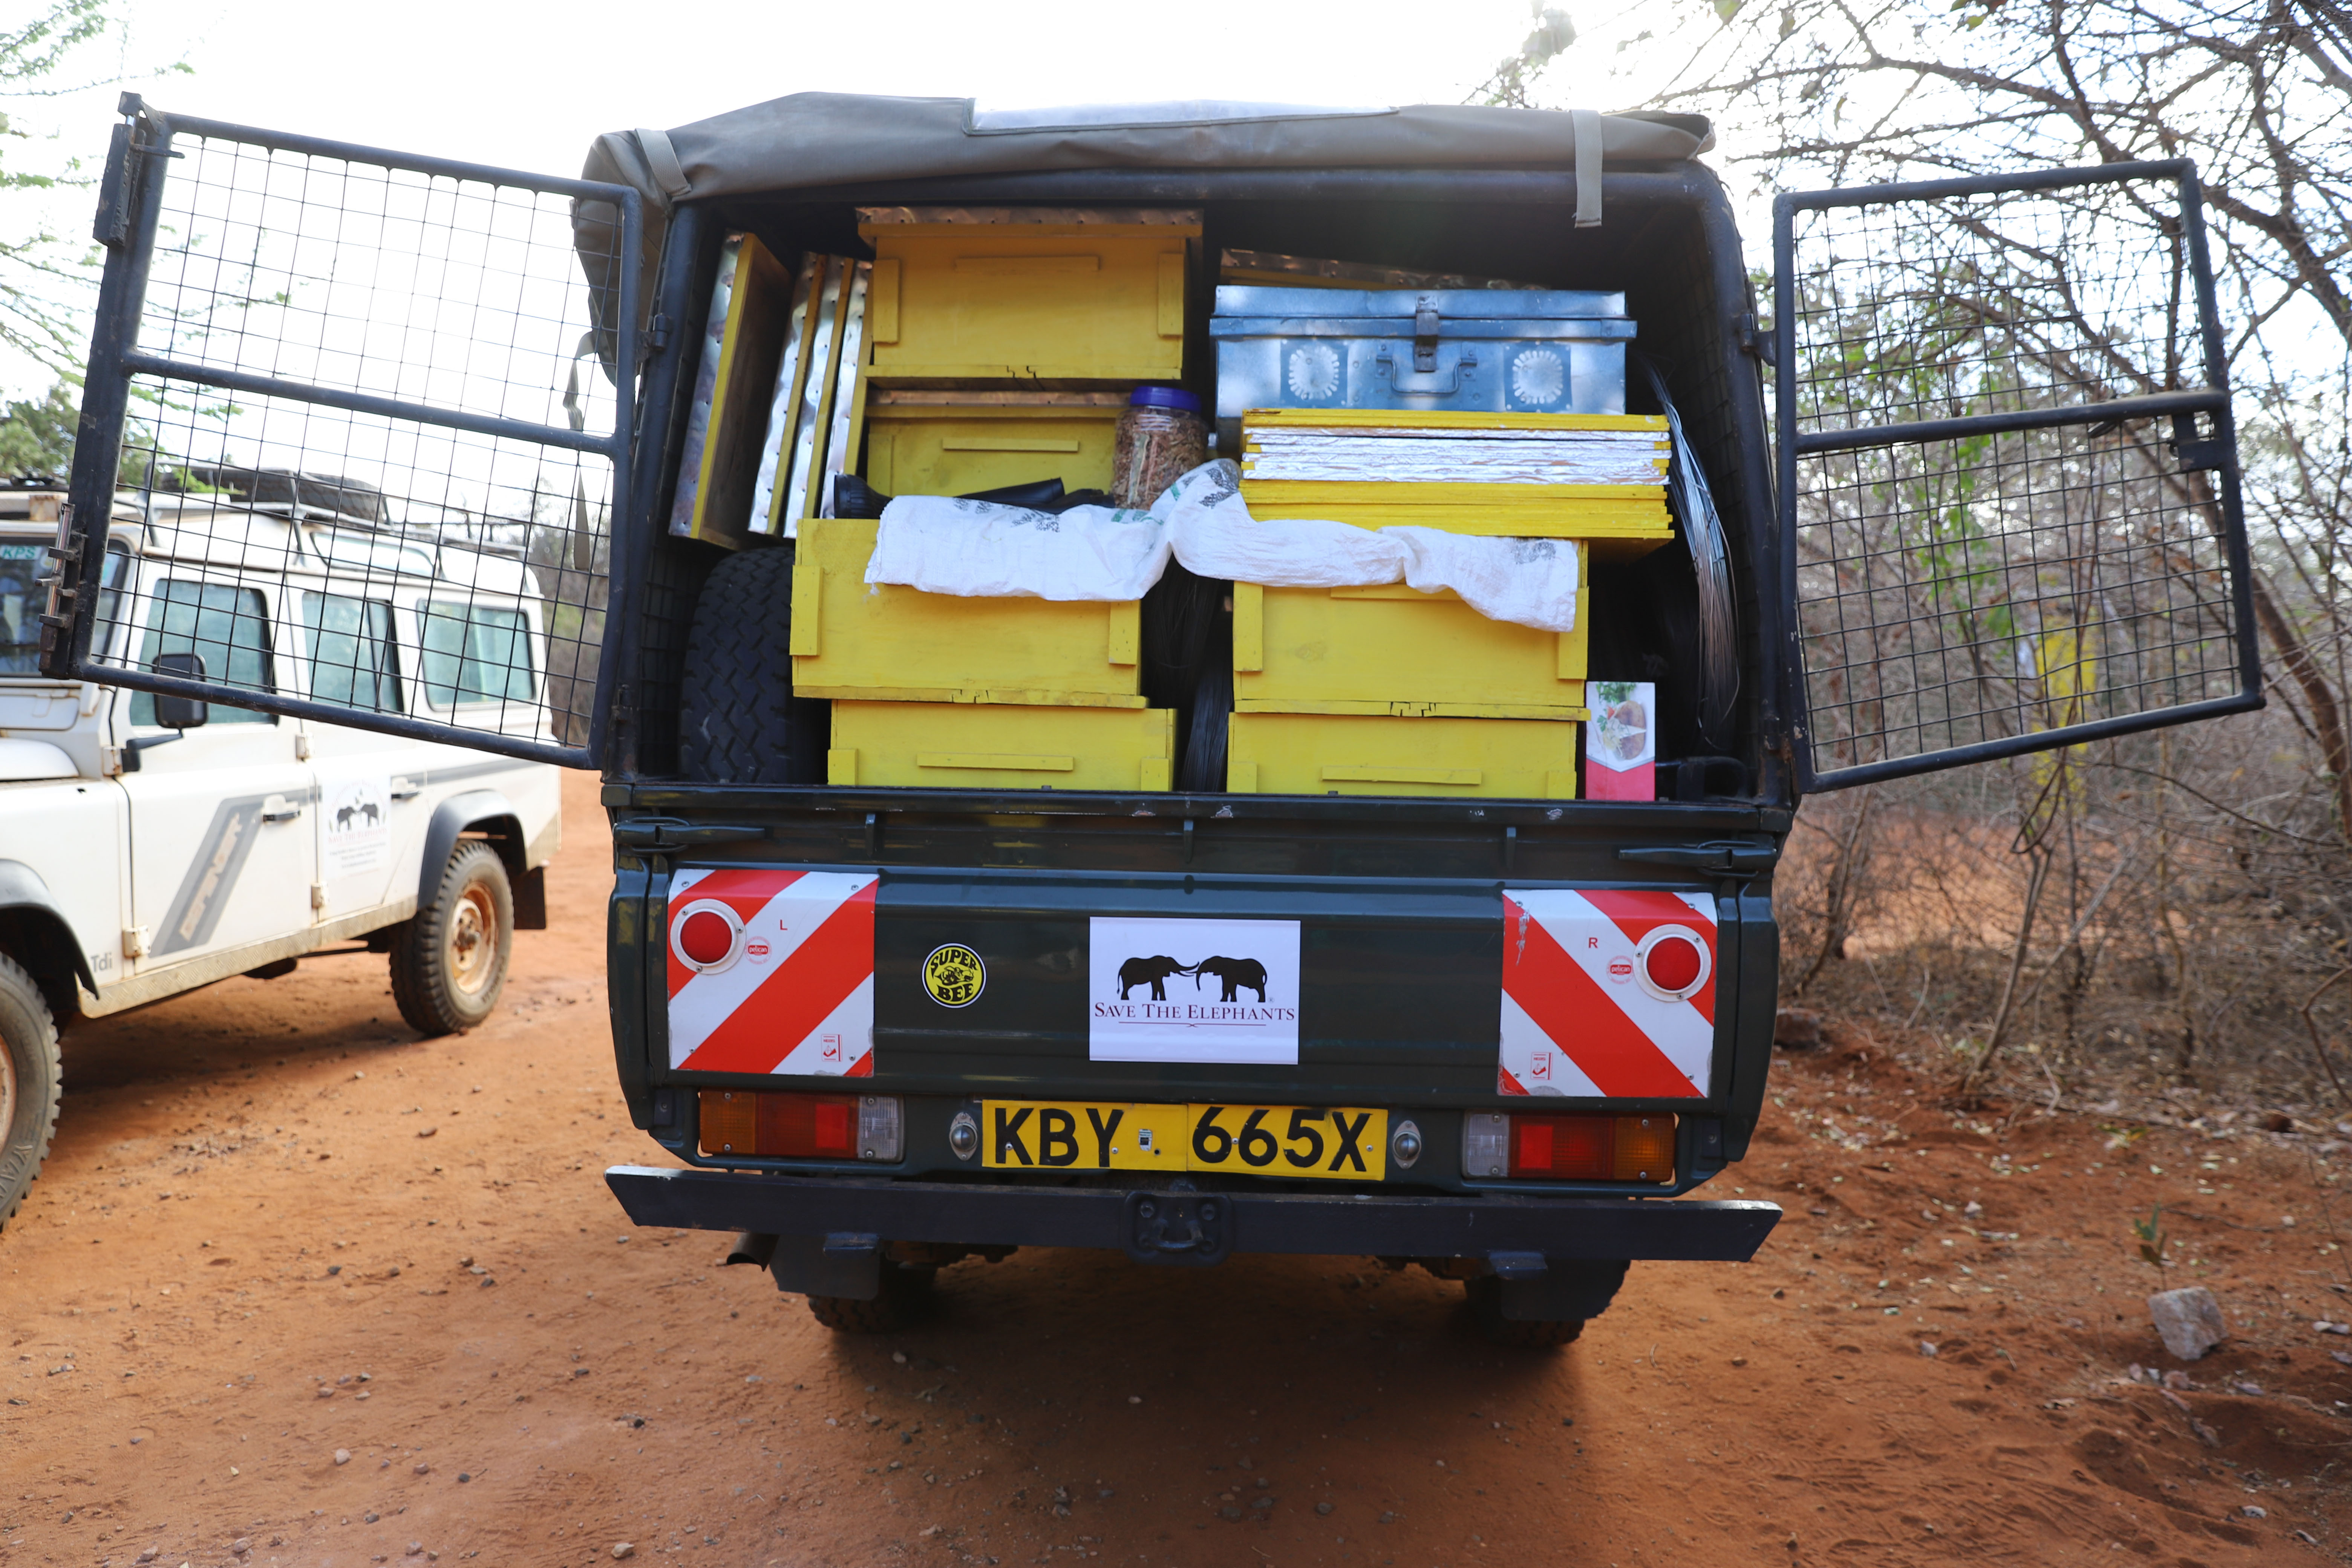 Loaded-mobile-unit-vehicle-before-beehive-fence-construction-in-Sagalla1-©-2018-Naiya-Raja